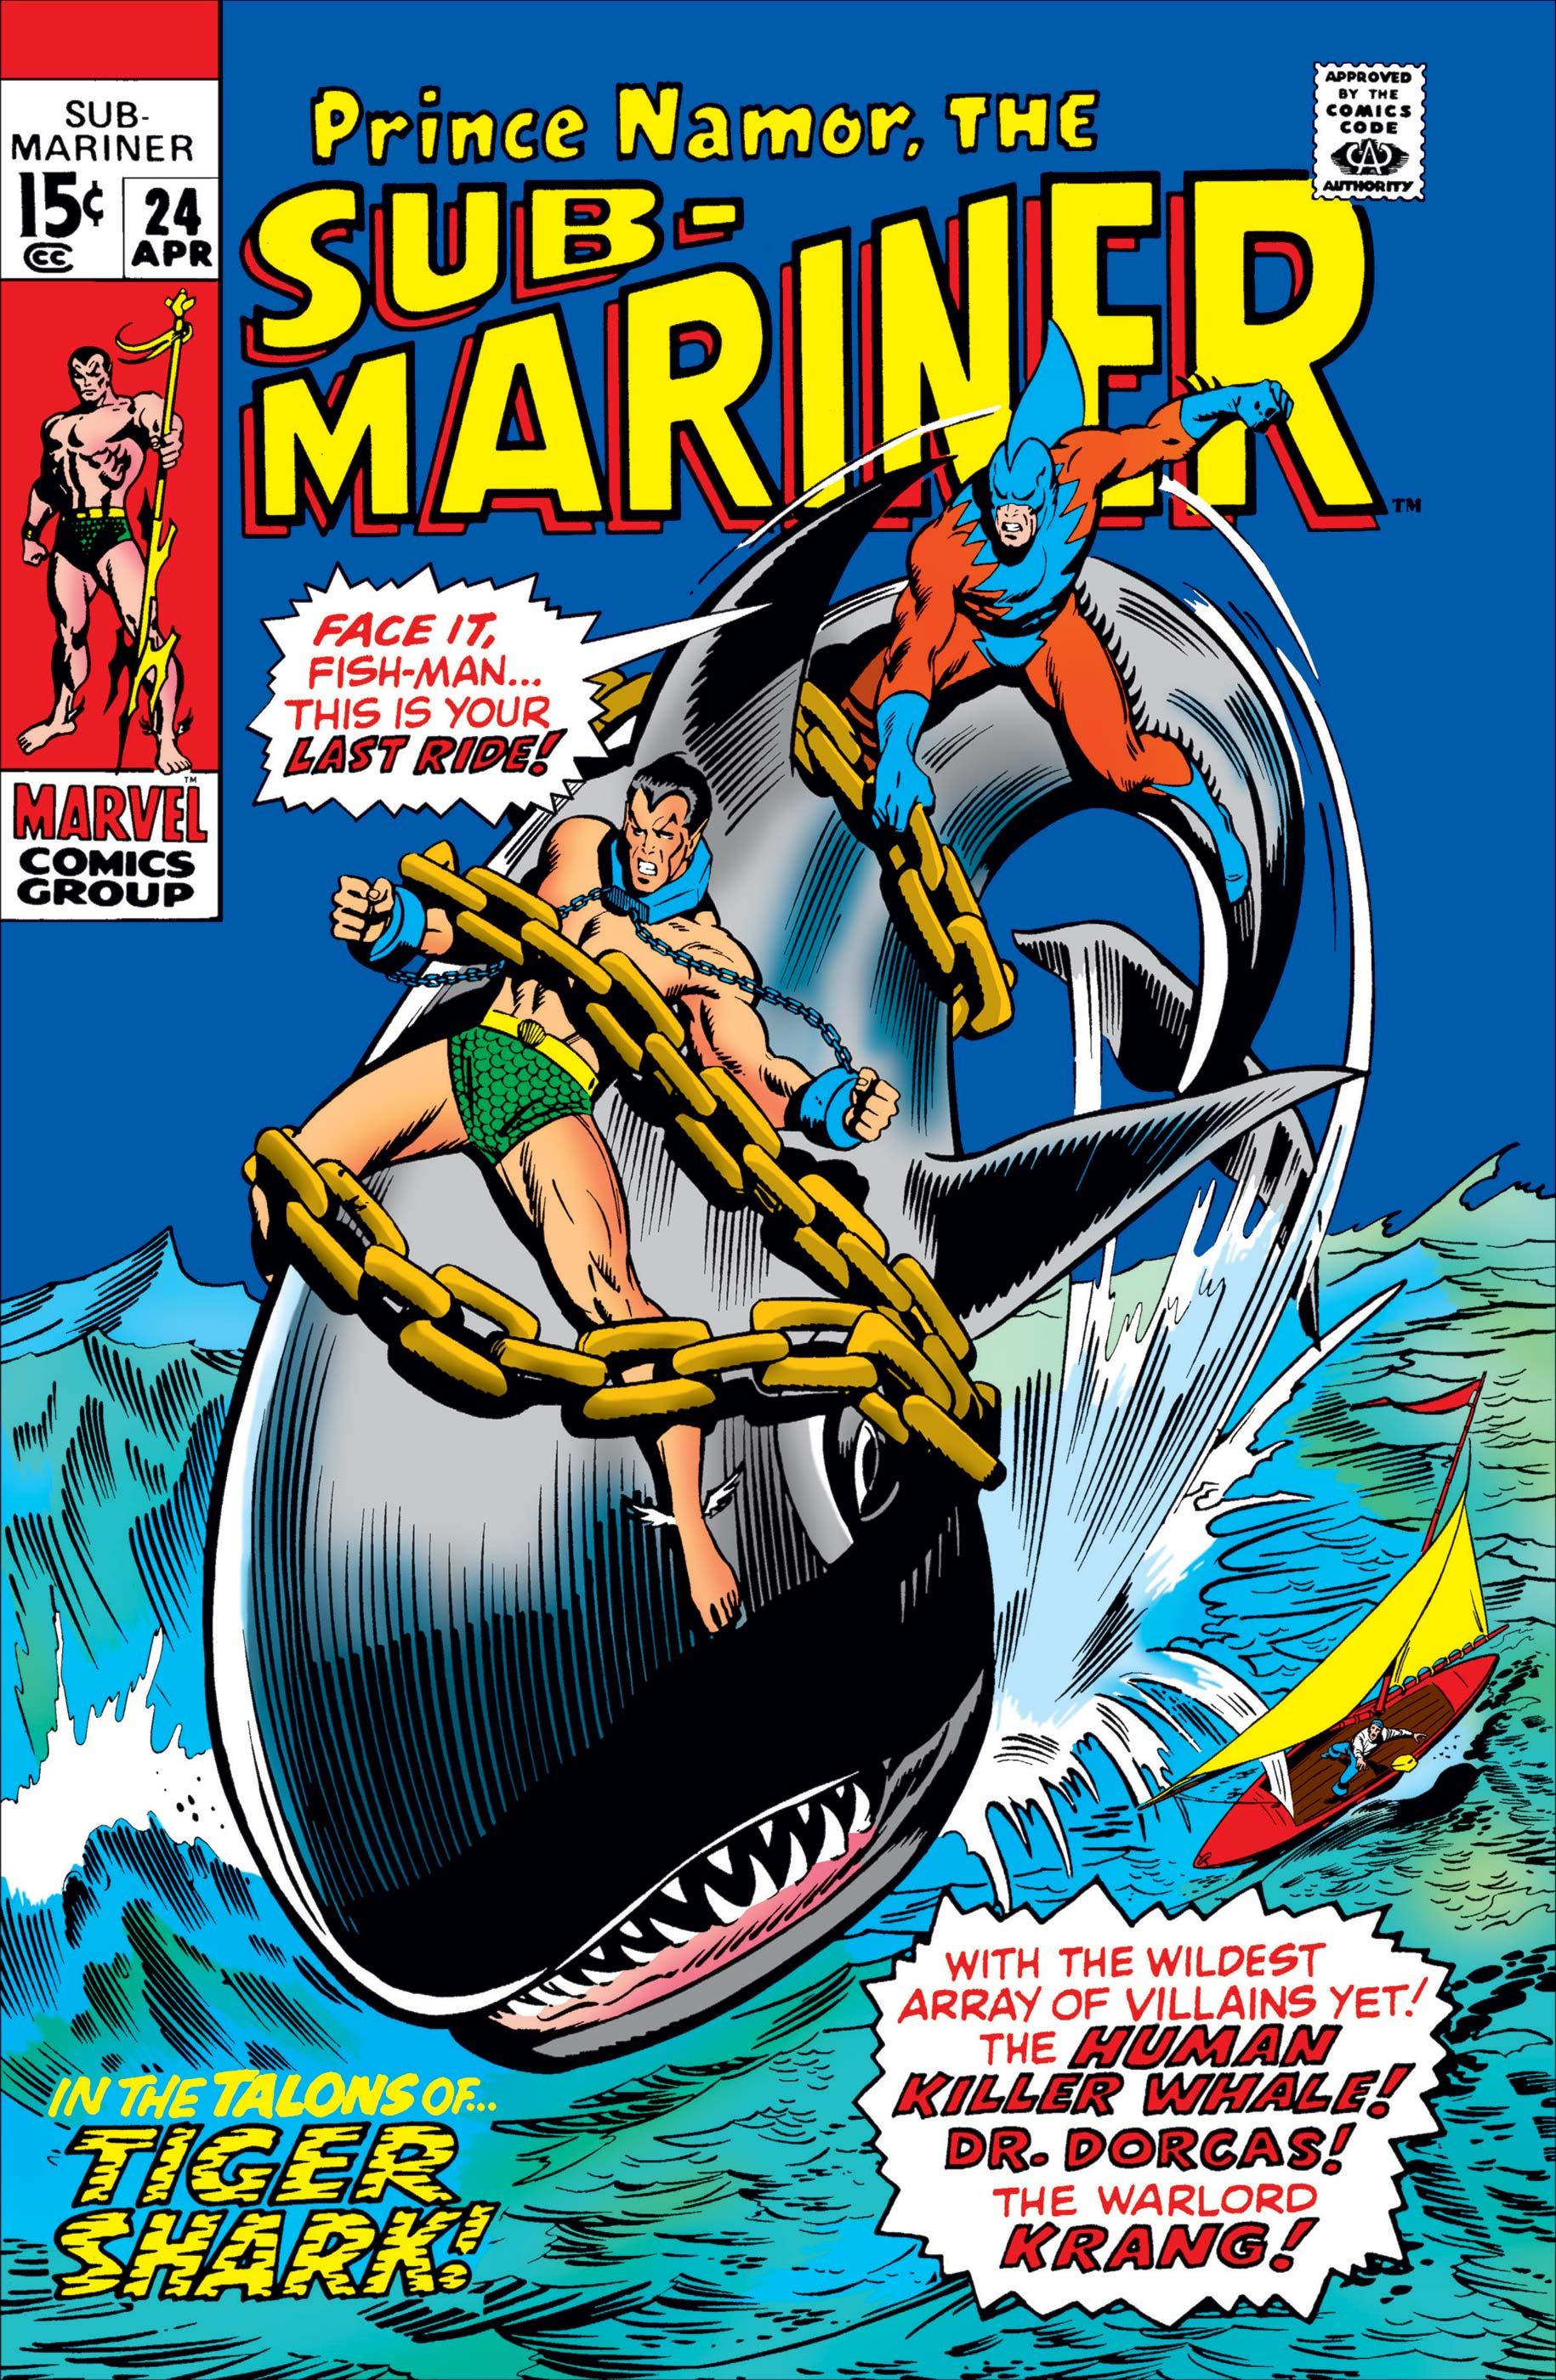 Sub-Mariner (1968) #24